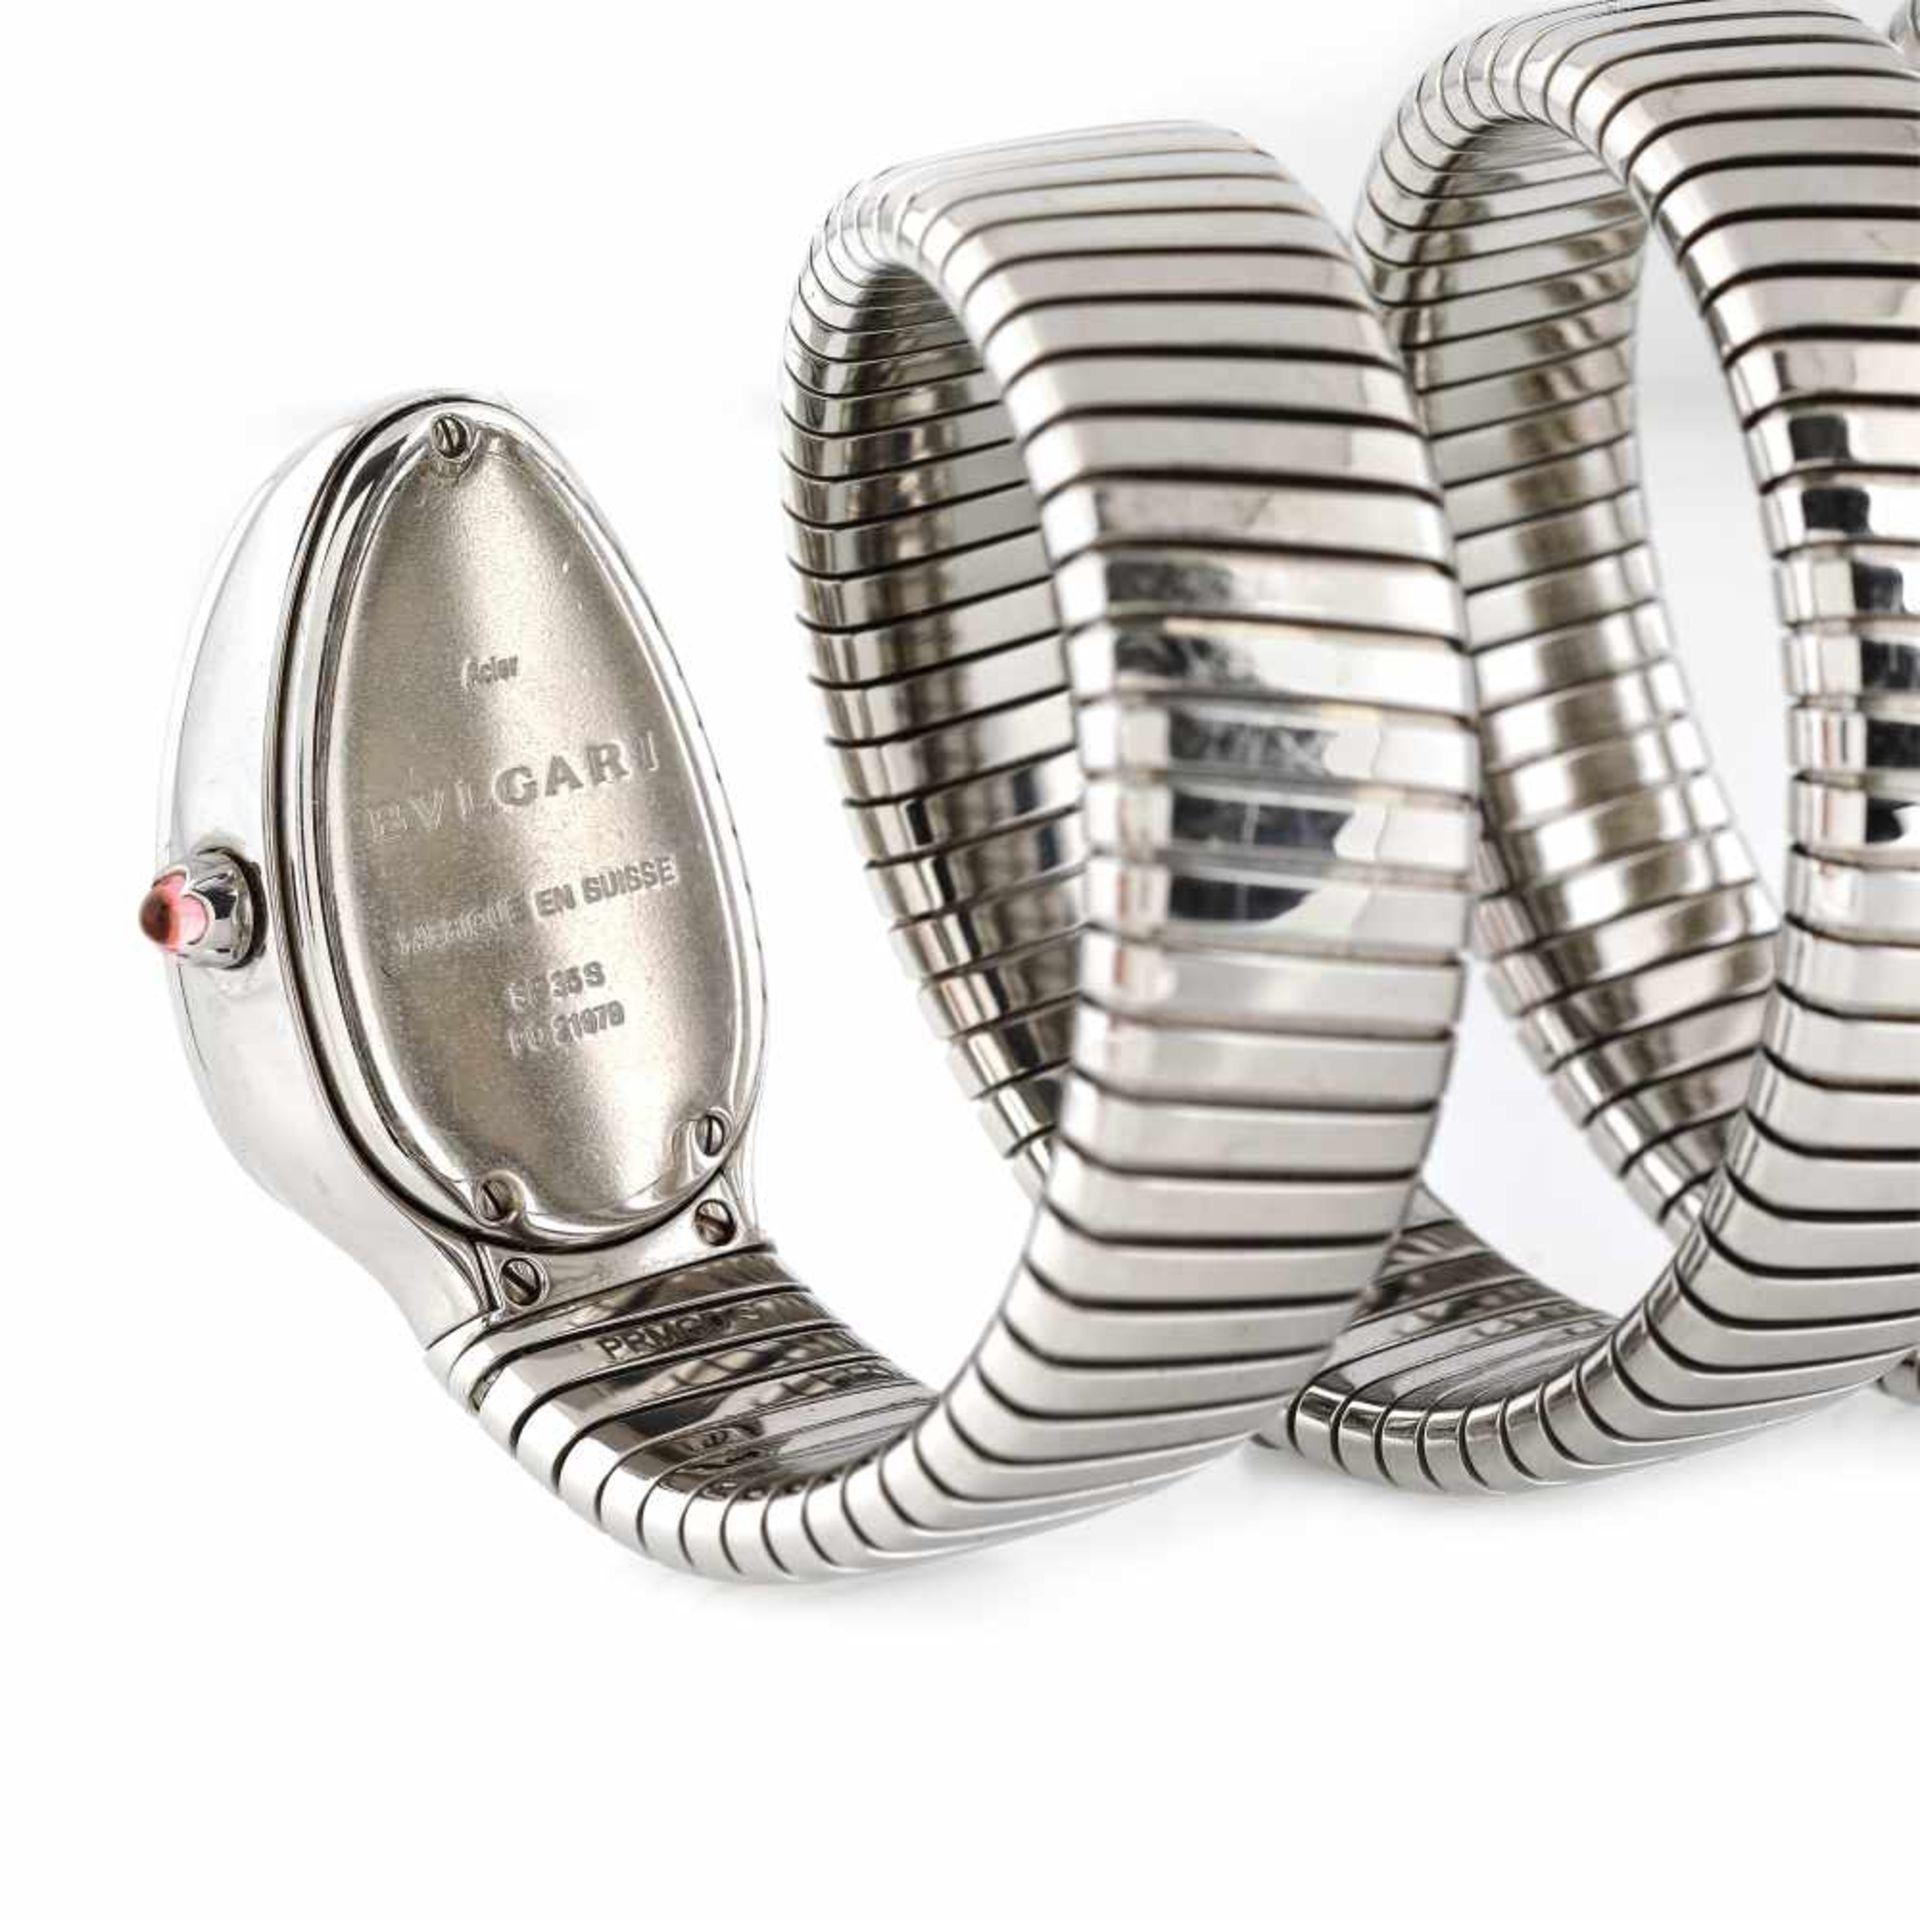 Bvlgari Serpenti Tubogas bracelet watch, women, decorated with diamonds, provenance documents - Bild 5 aus 5